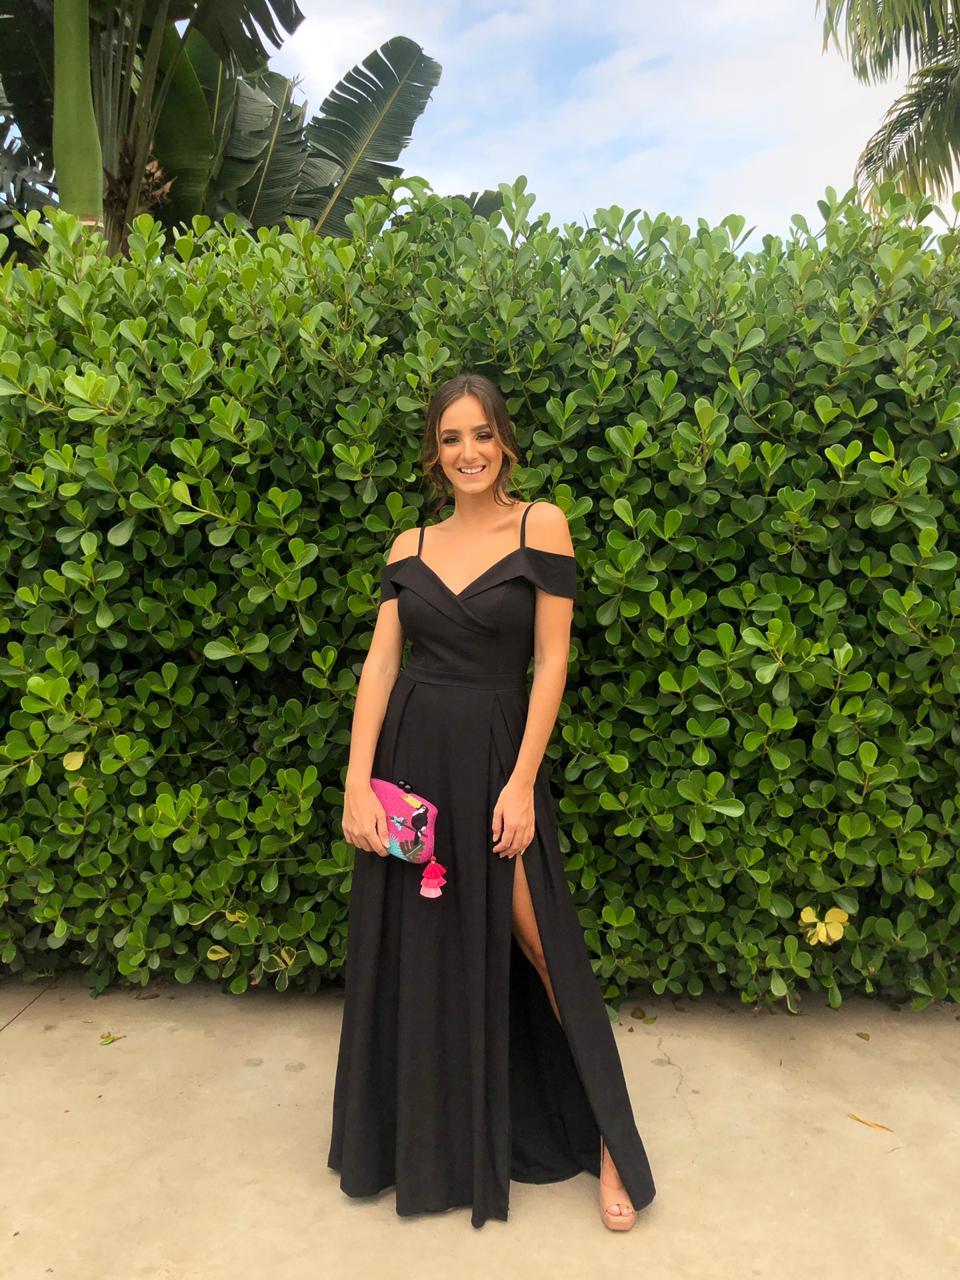 Vestido Nicarágua preto